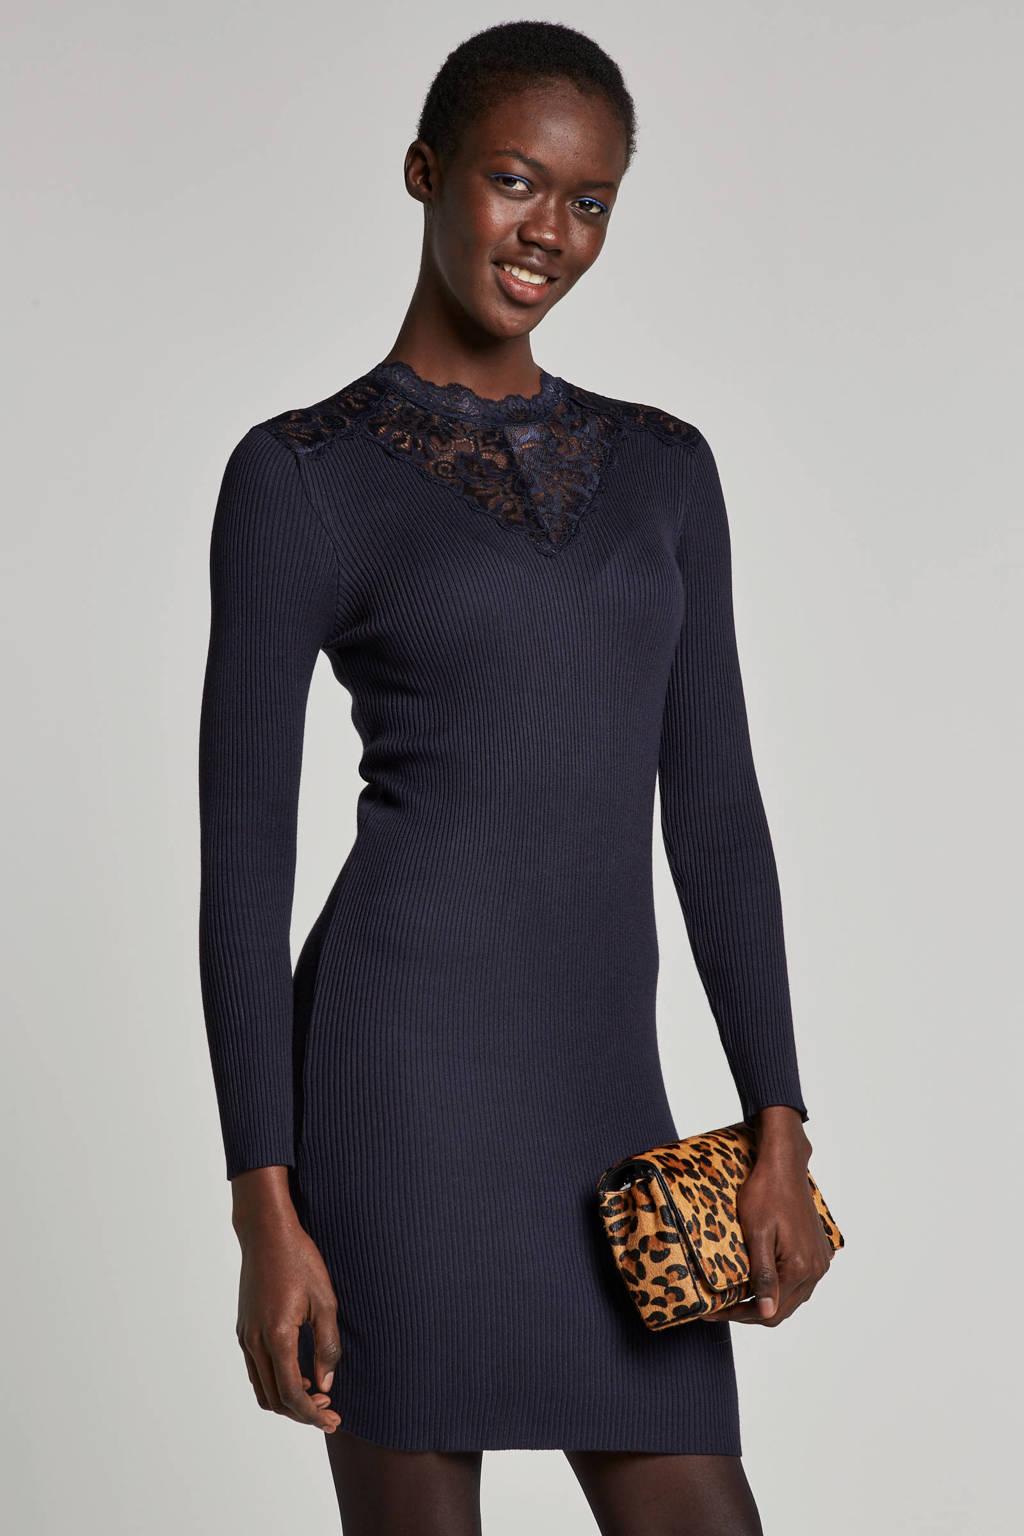 ONLY jurk met kanten details, Donkerblauw